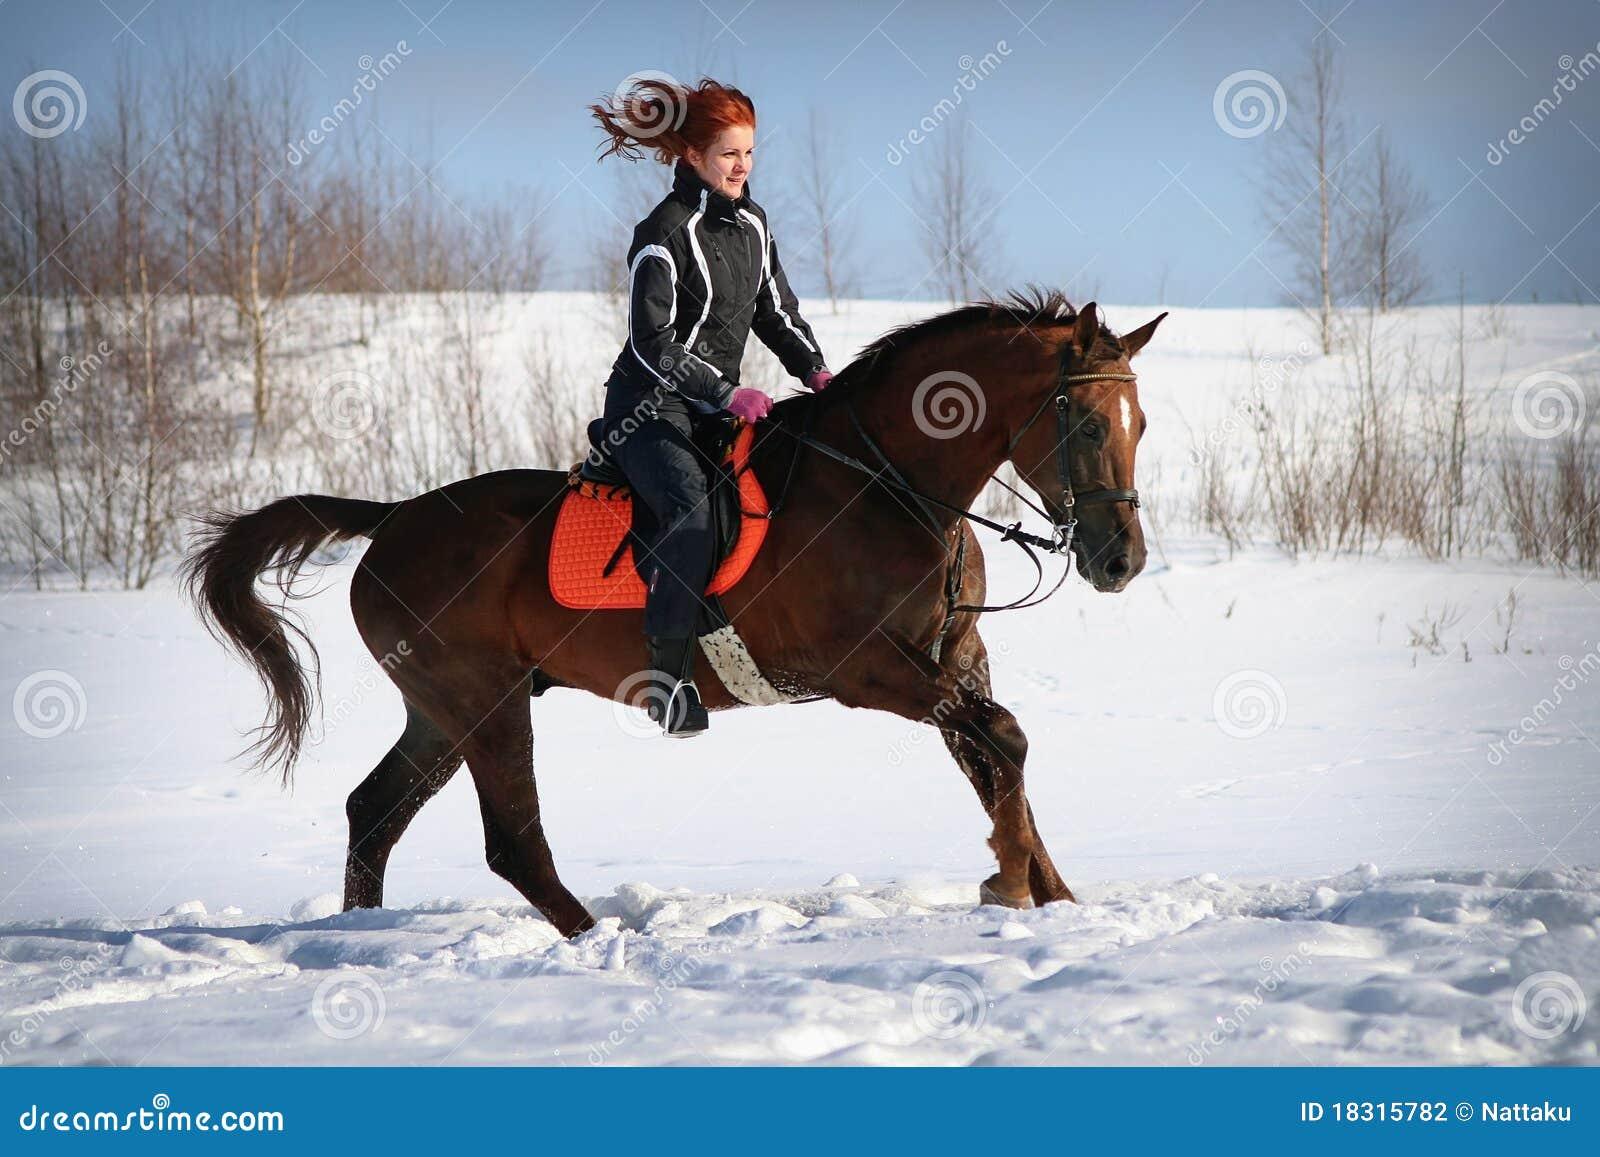 Winter Horse Ride Stock Photo Image Of Mammal Equitation 18315782